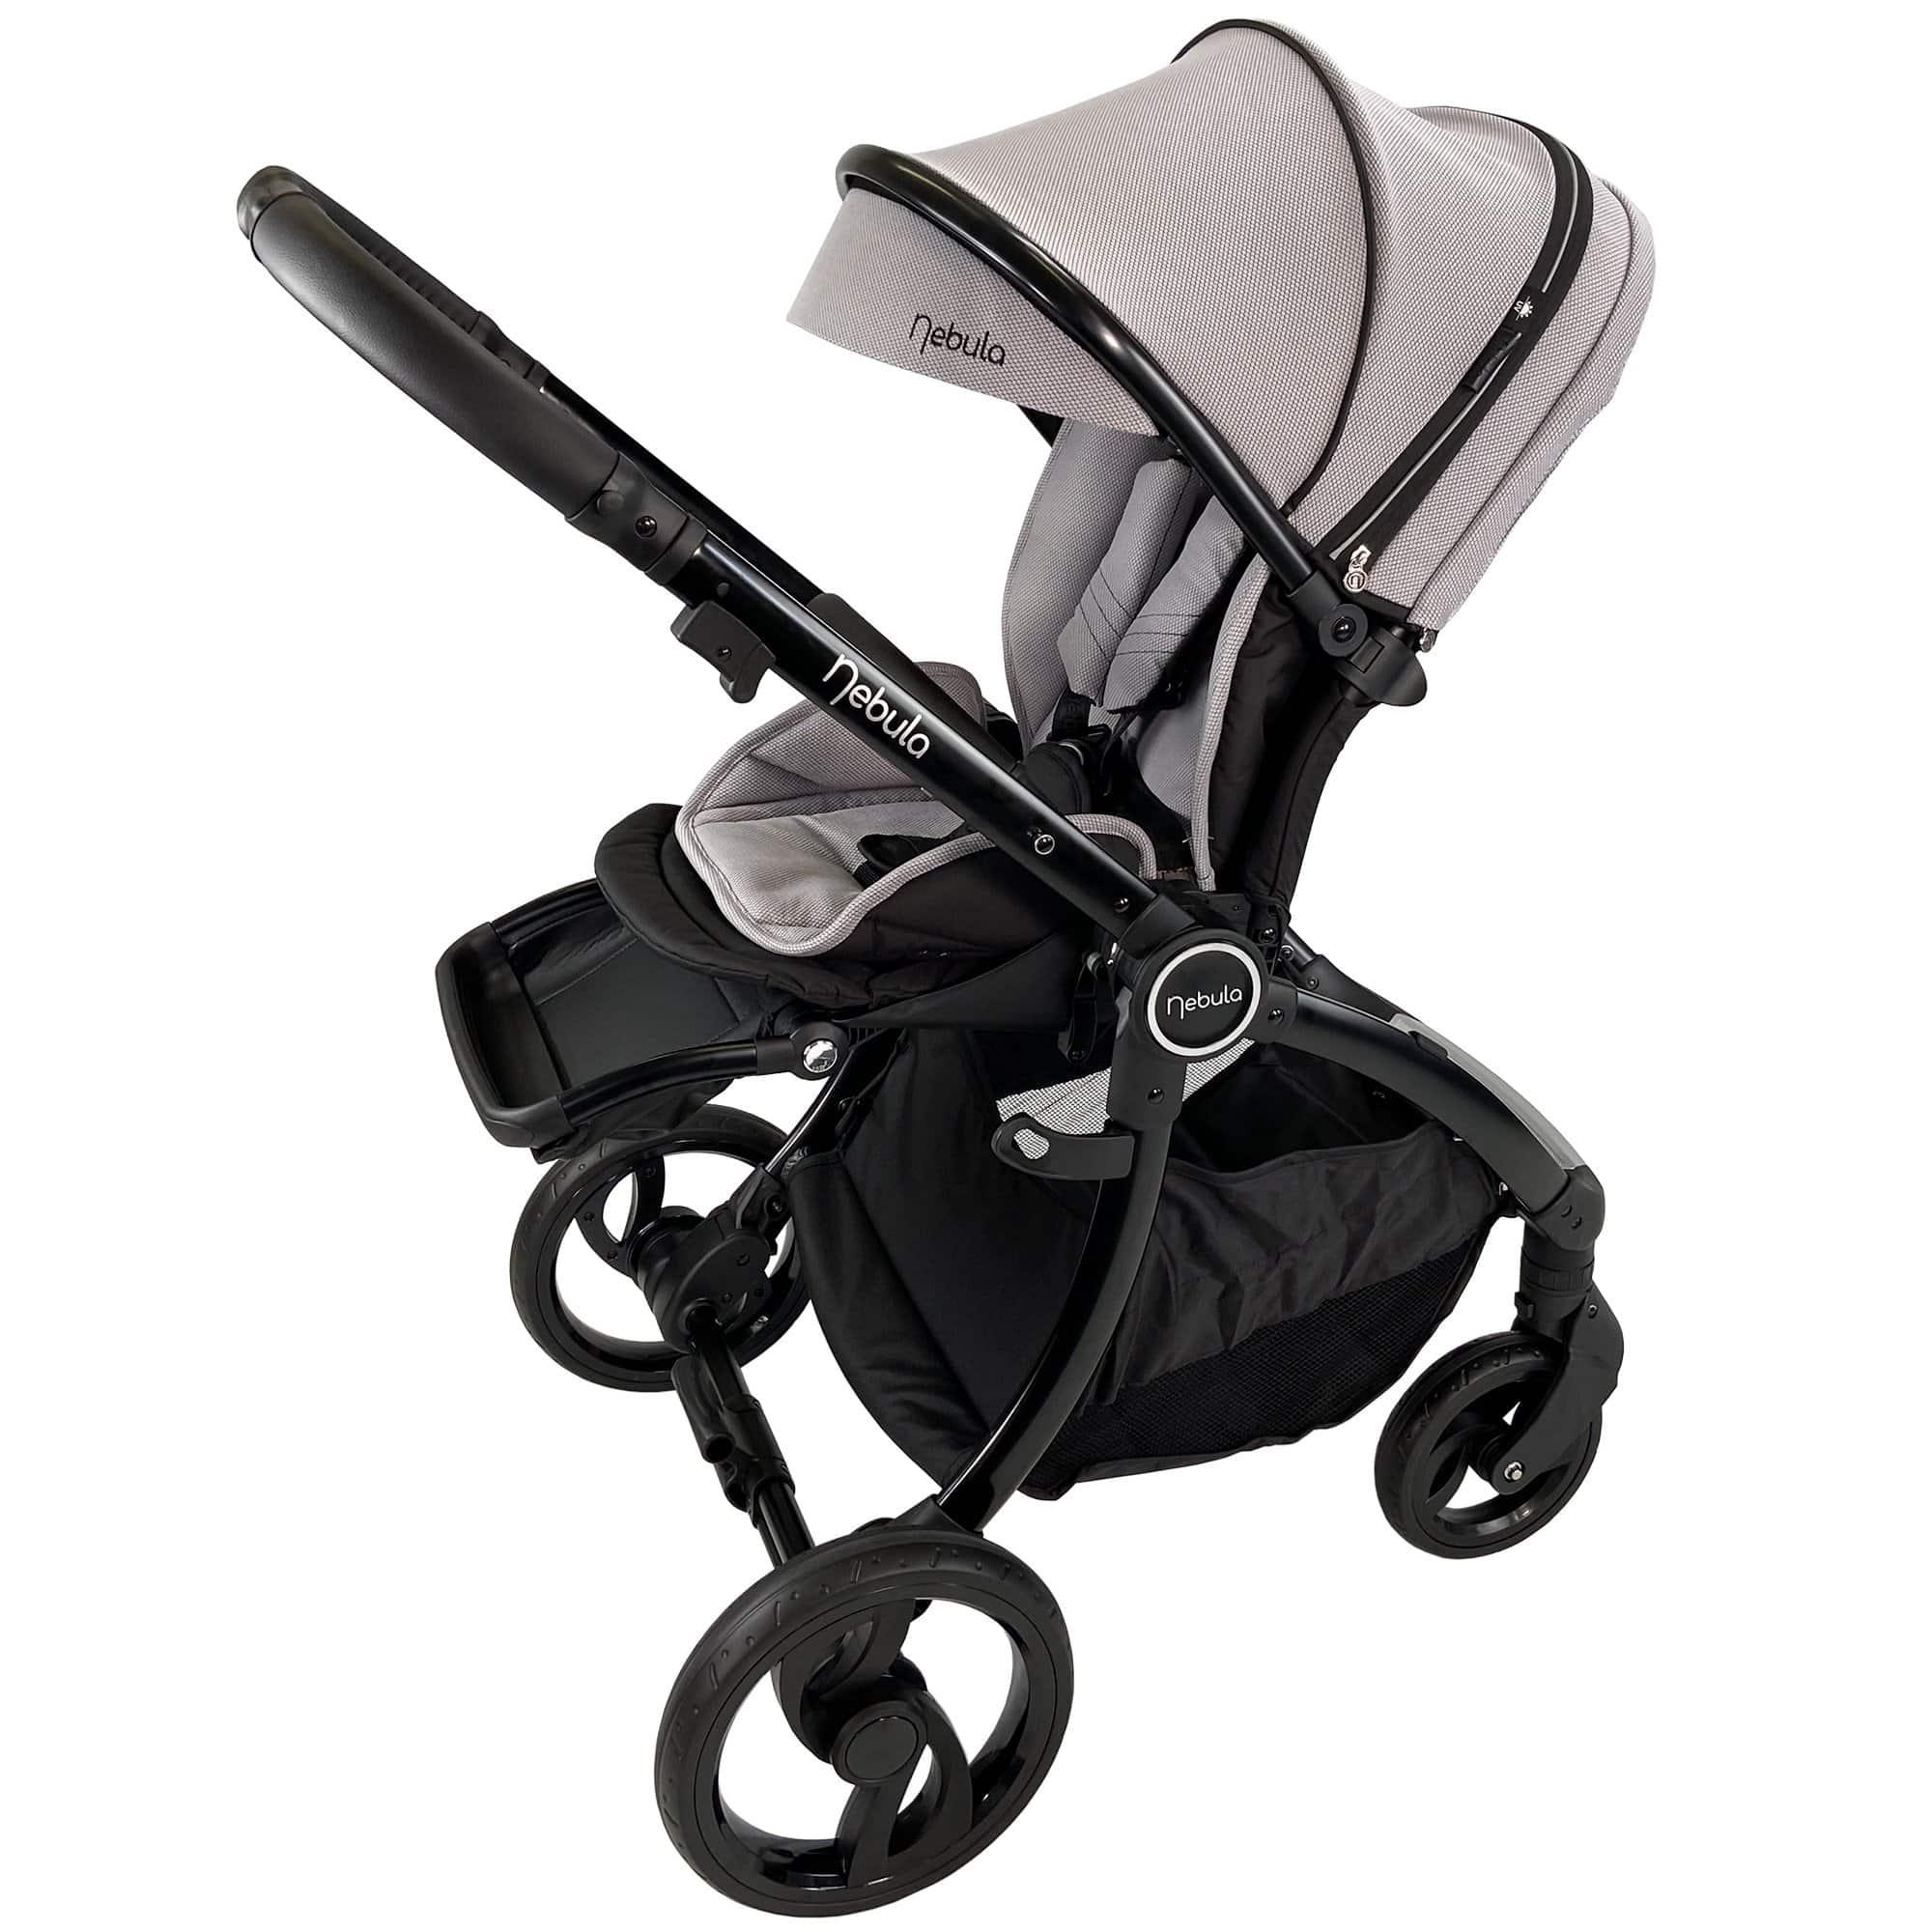 Venture Nebula Cool Grey baby stroller in parent facing mode